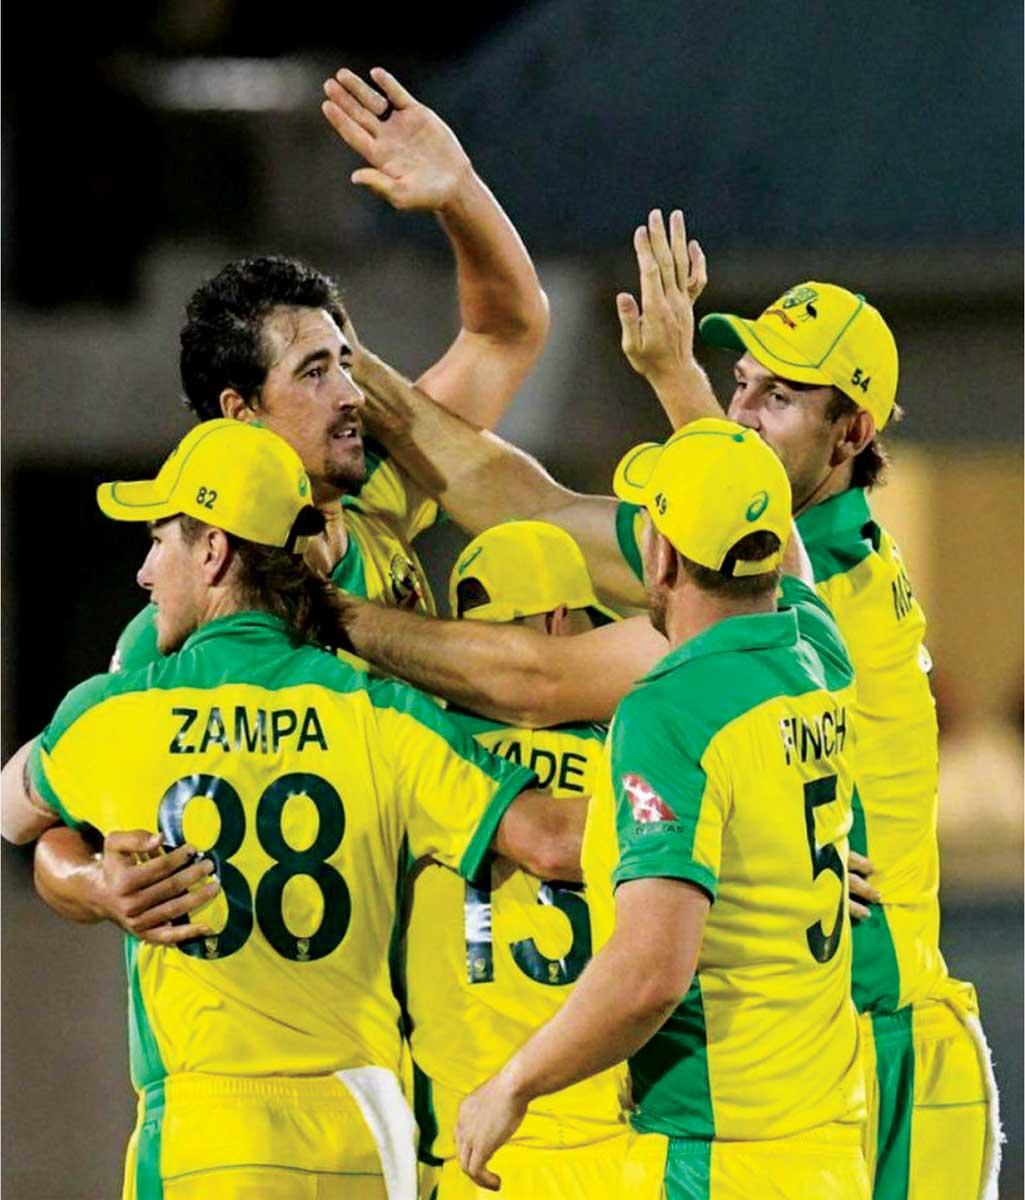 Image: Australia celebrate clinching victory. (Photo: AFP/GI)